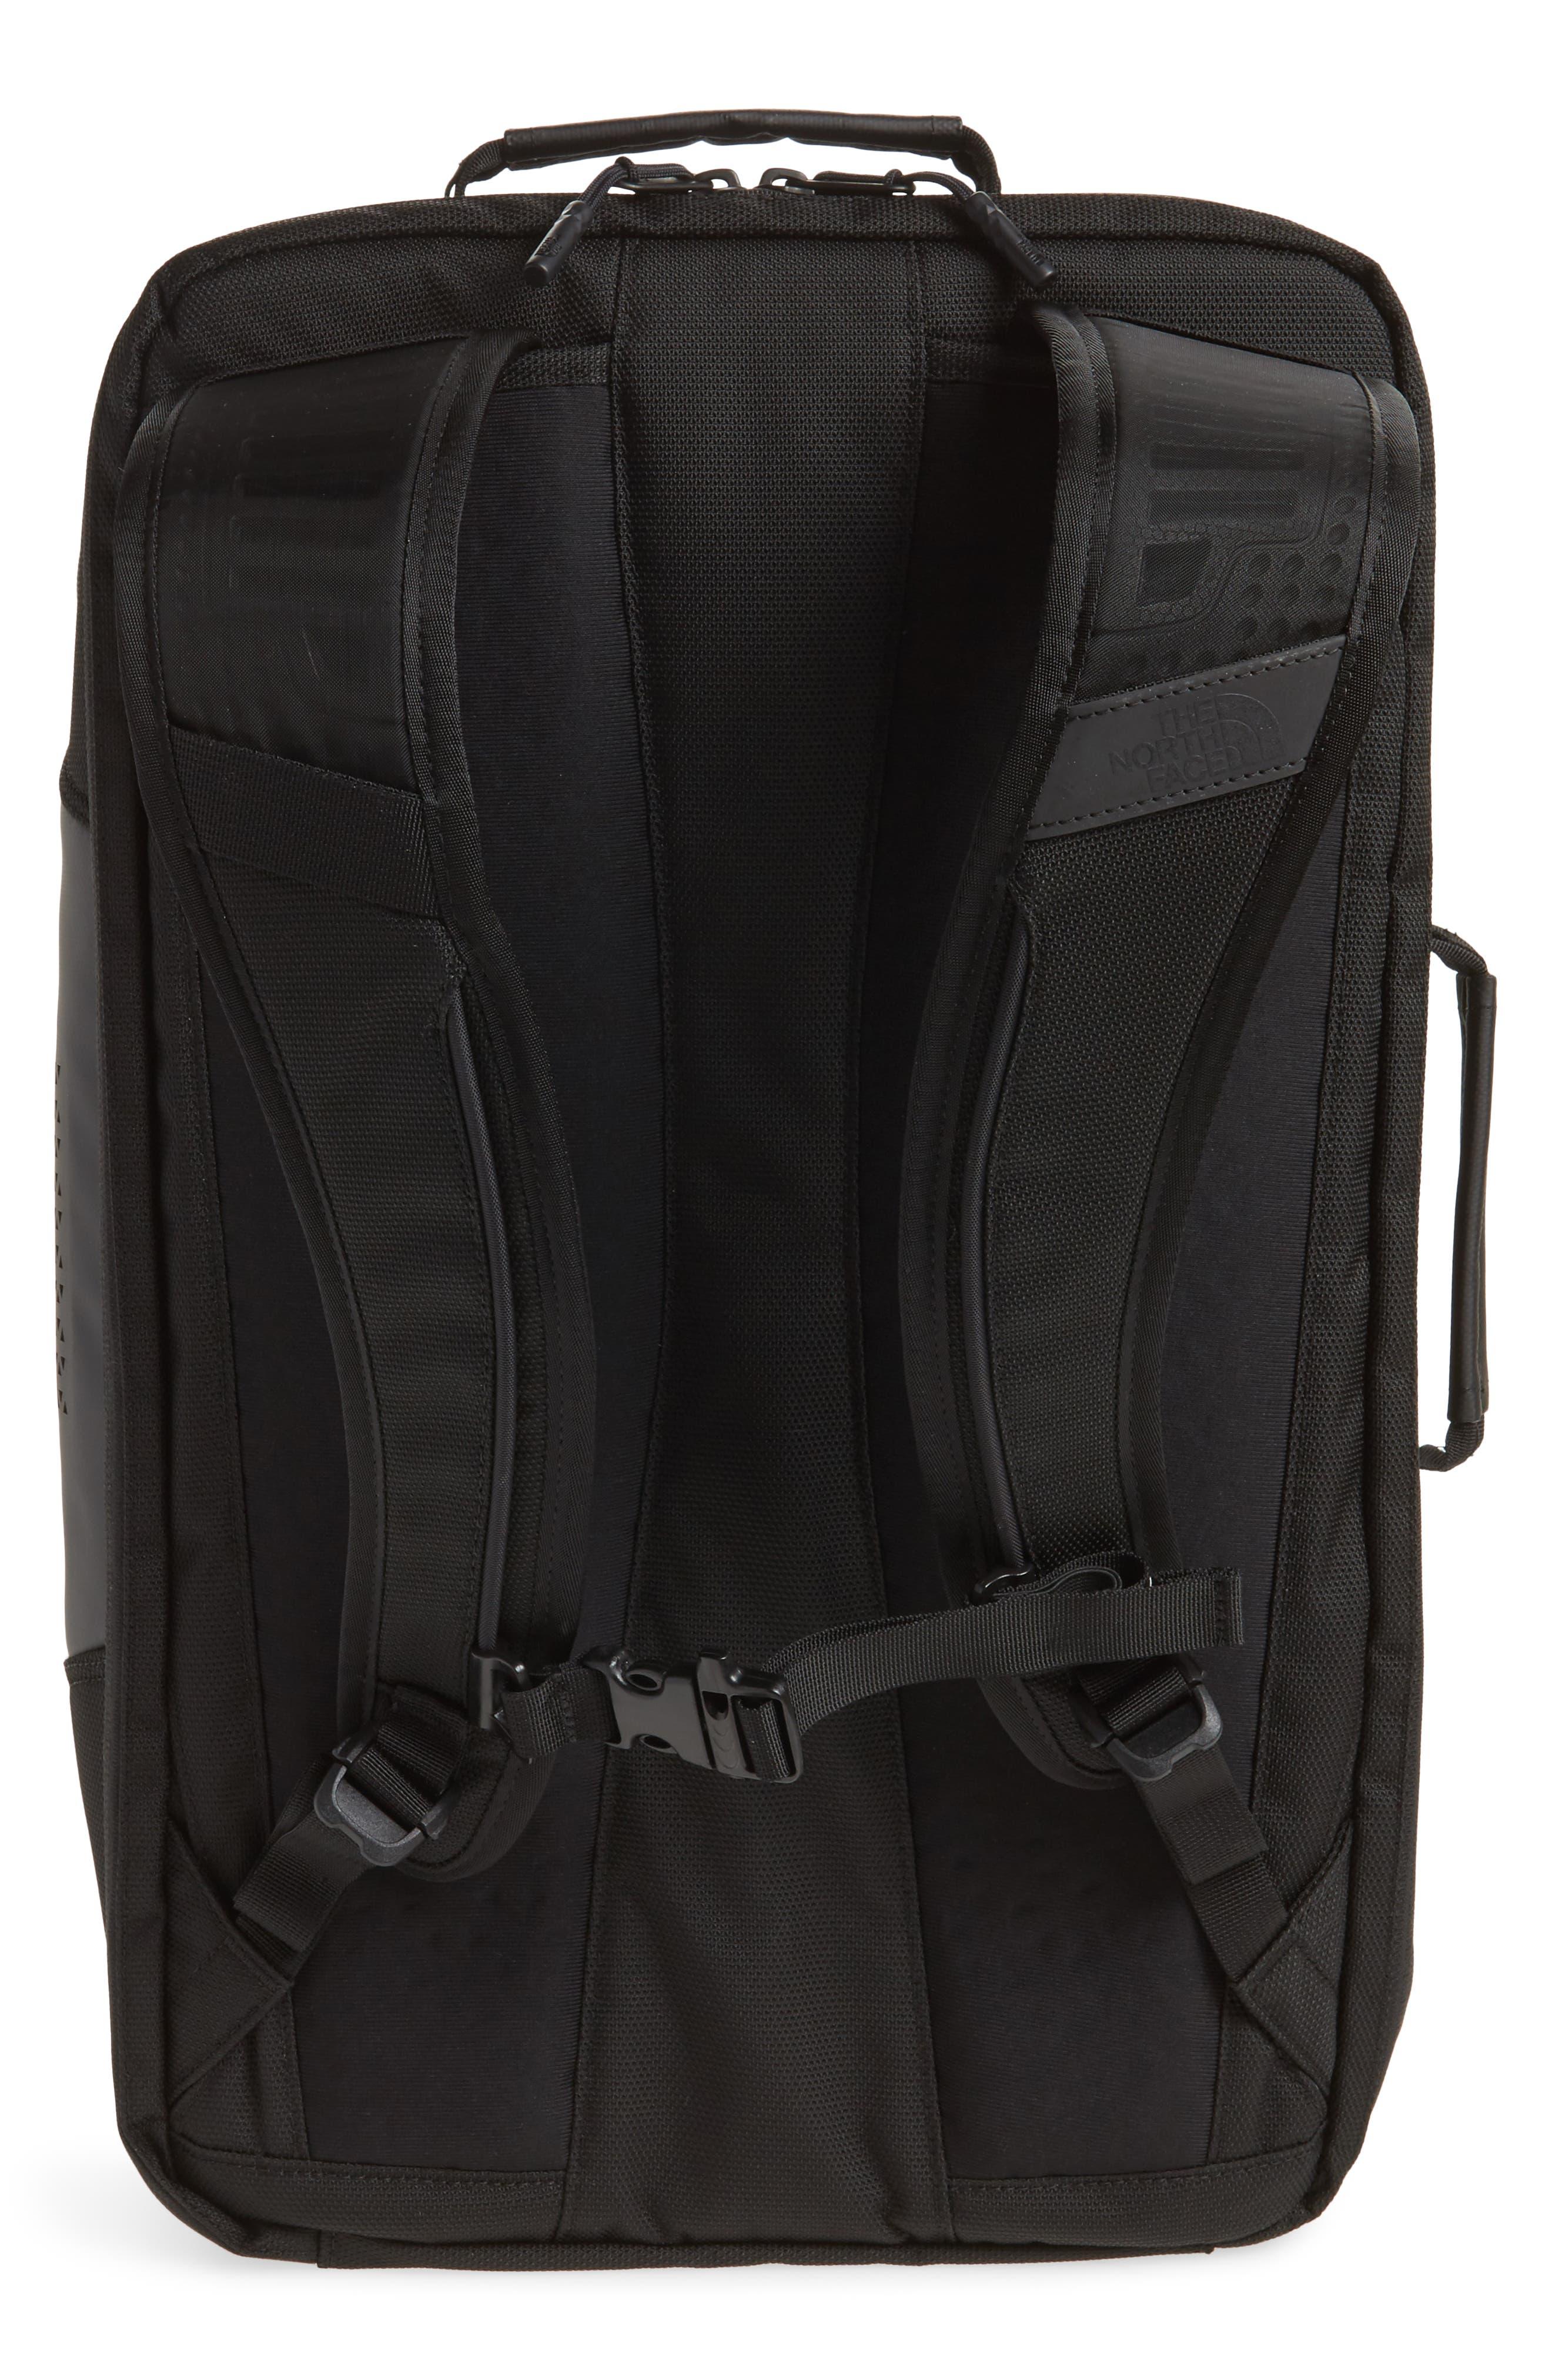 Refractor Duffel Backpack,                             Alternate thumbnail 3, color,                             001